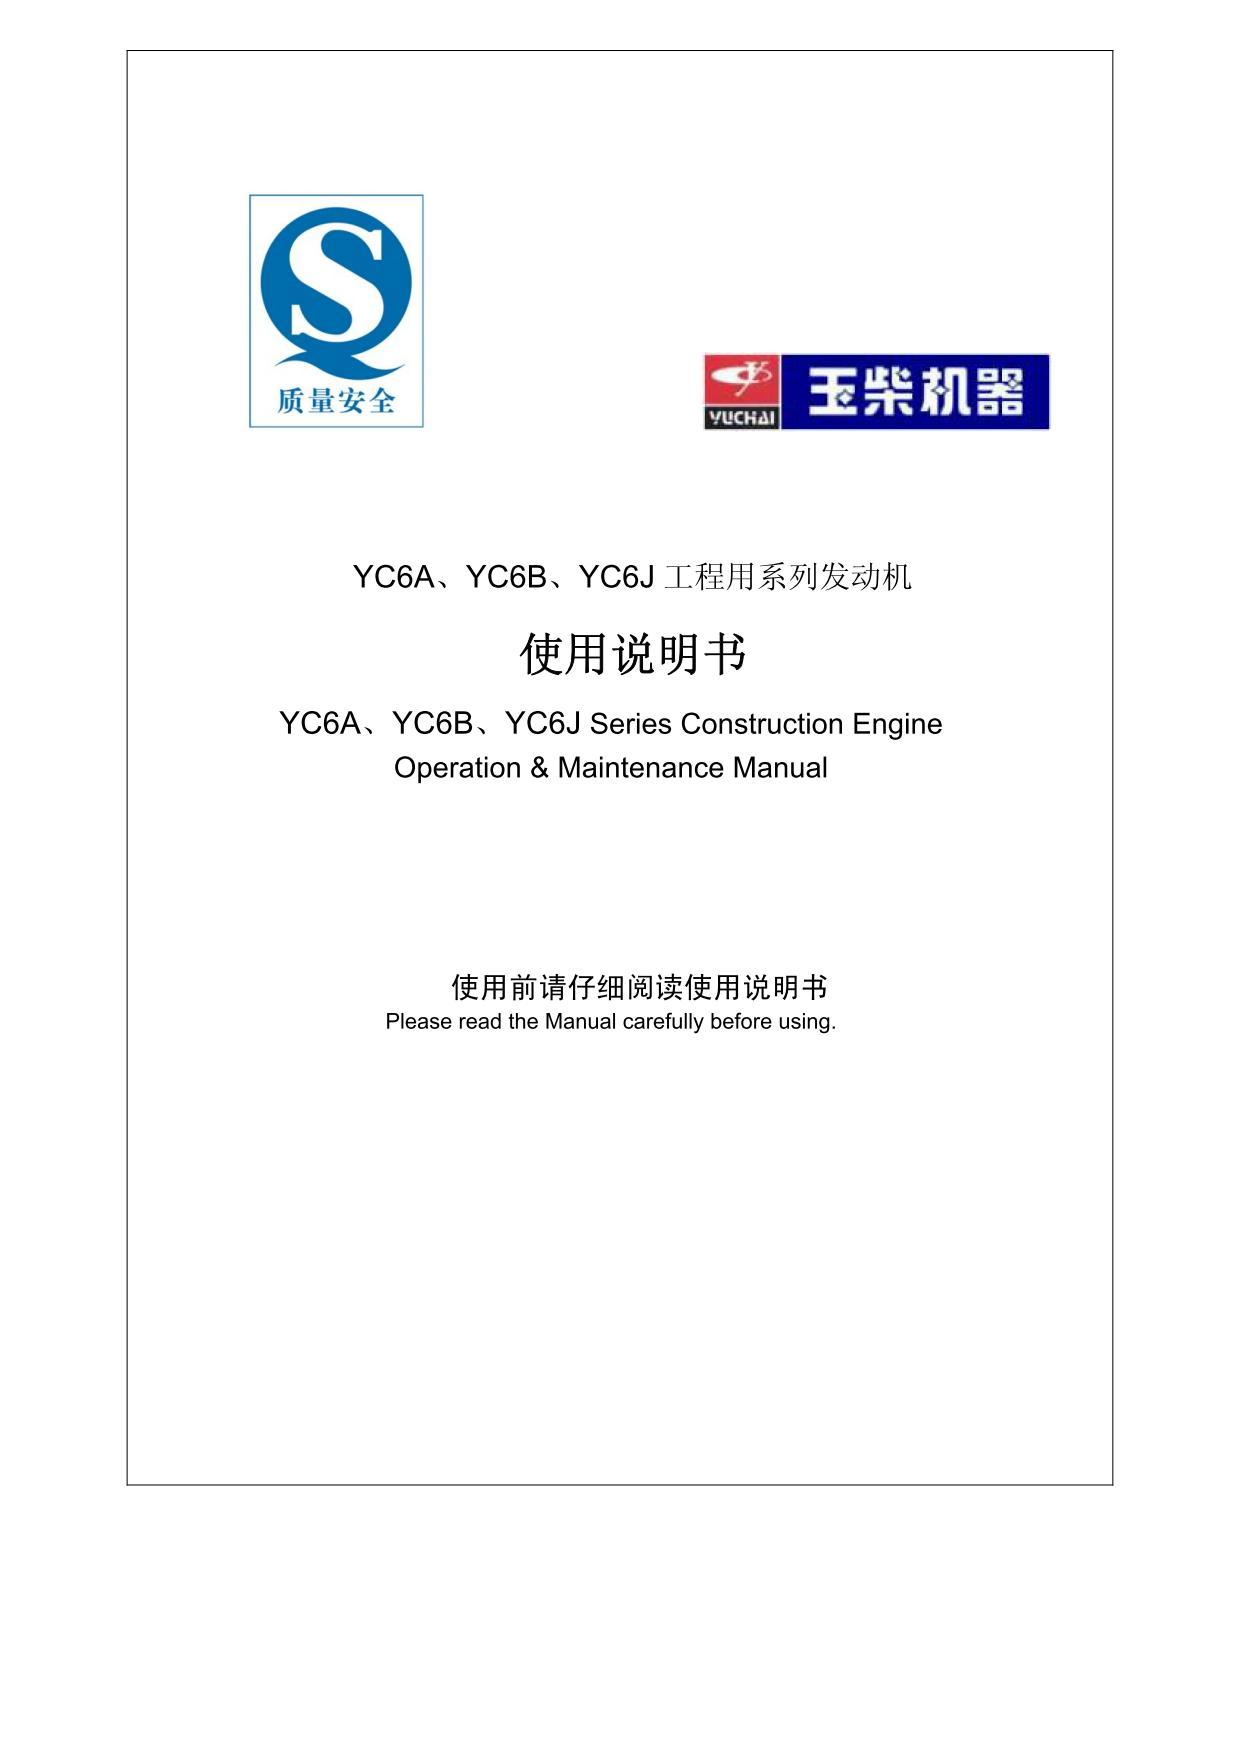 Ремонт и эксплуатация YUCHAI  YC6J125Z-T20